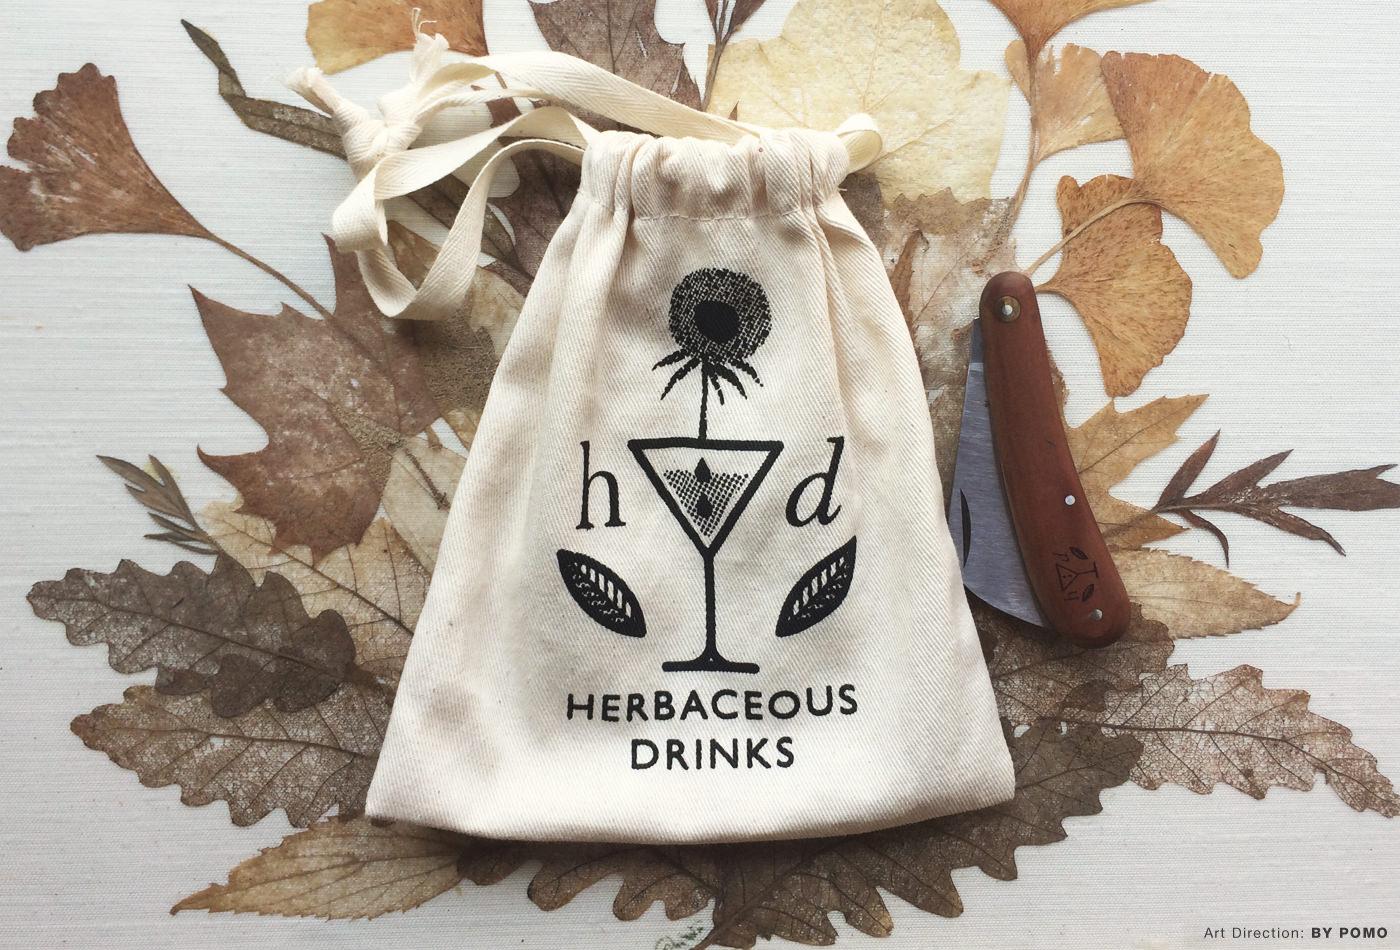 vacaliebres-pomo-herbaceous-drinks-logo-branding-drinks-herbs-art direction